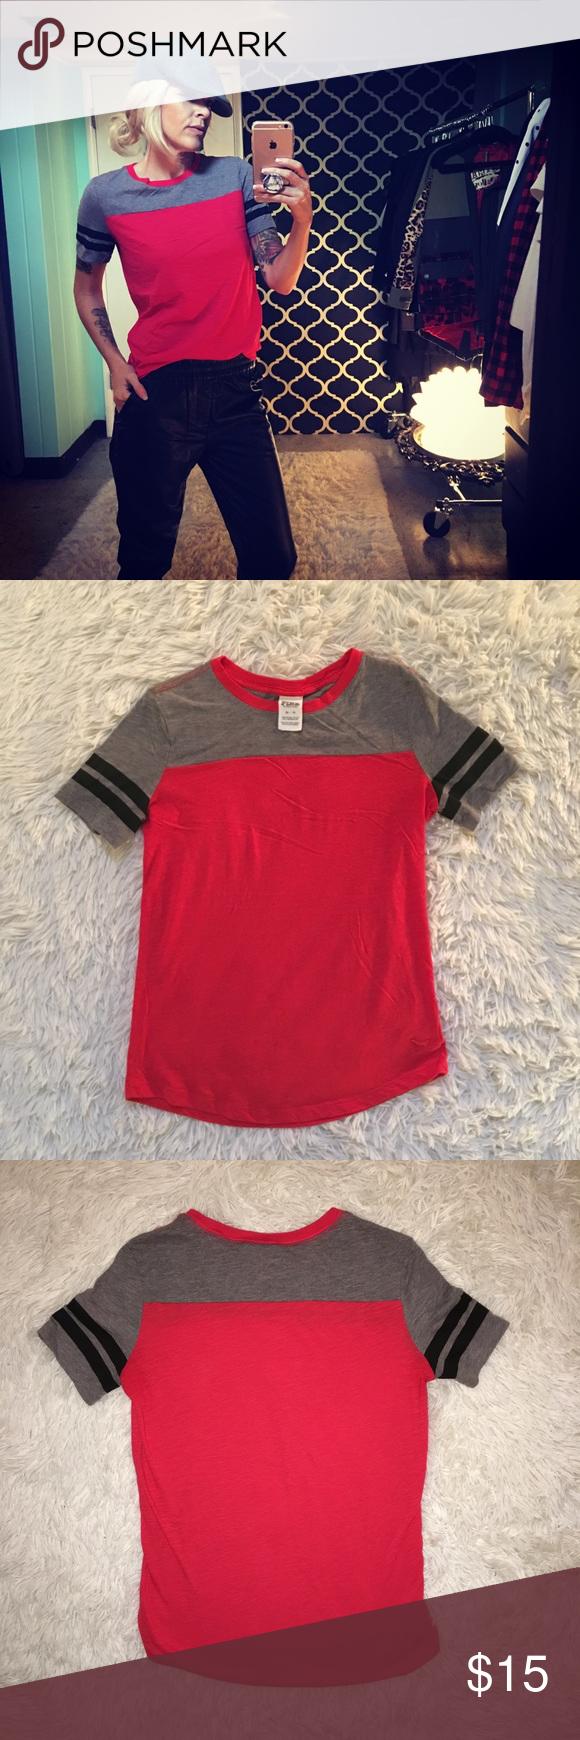 PINK Victoria's Secret T-Shirt PINK Victoria's Secret T-Shirt. Size XS.  60% Cotton, 40% Polyester. Excellent condition. PINK Victoria's Secret Tops Tees - Short Sleeve